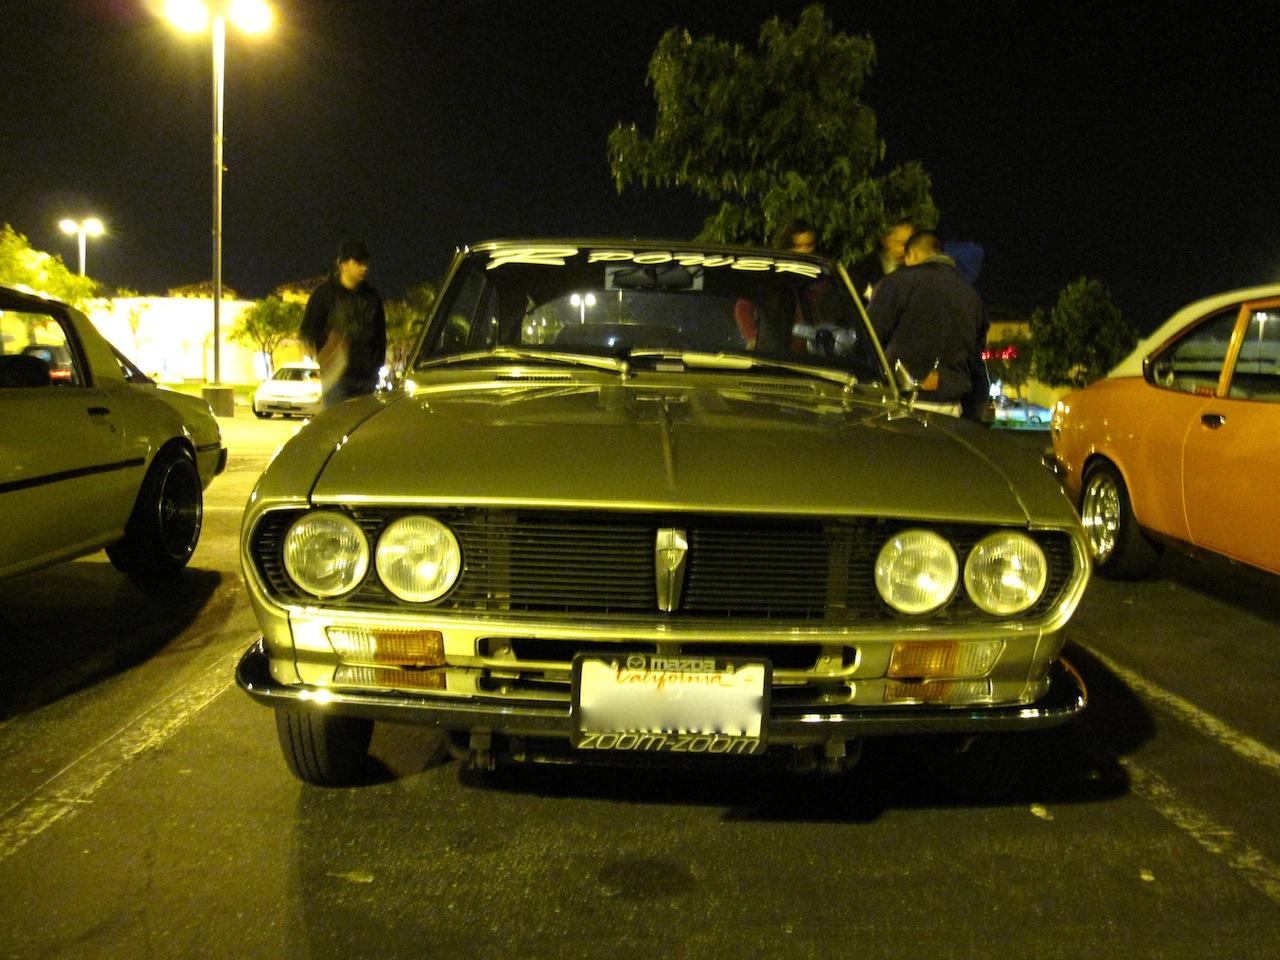 The Auto Fanatic: Japanese Nostalgic Car Meet